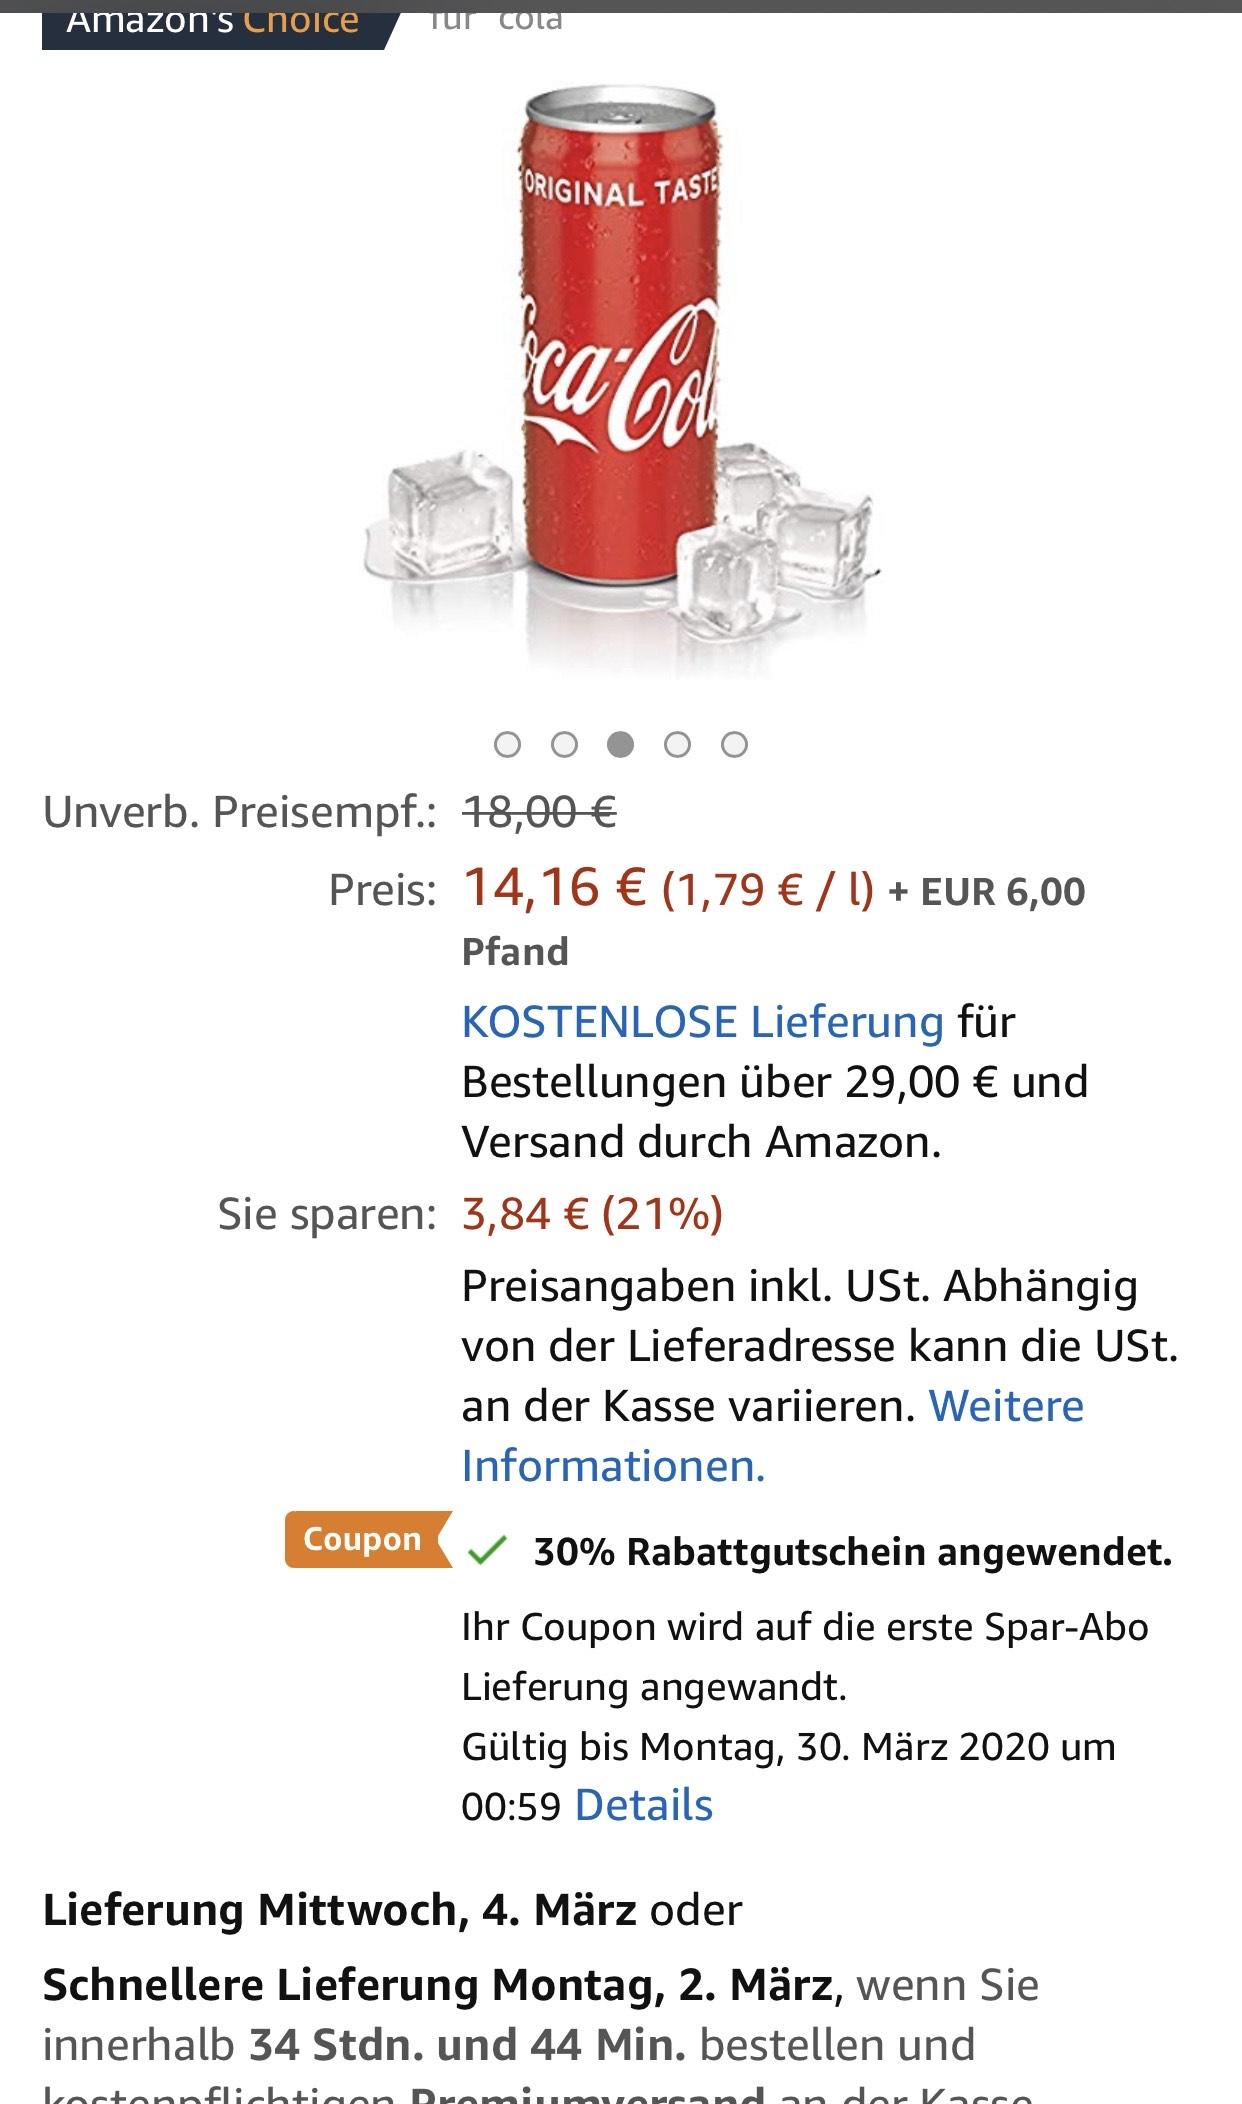 Amazon Coca Cola Classic 24*330ml -30%Rabattgutschein